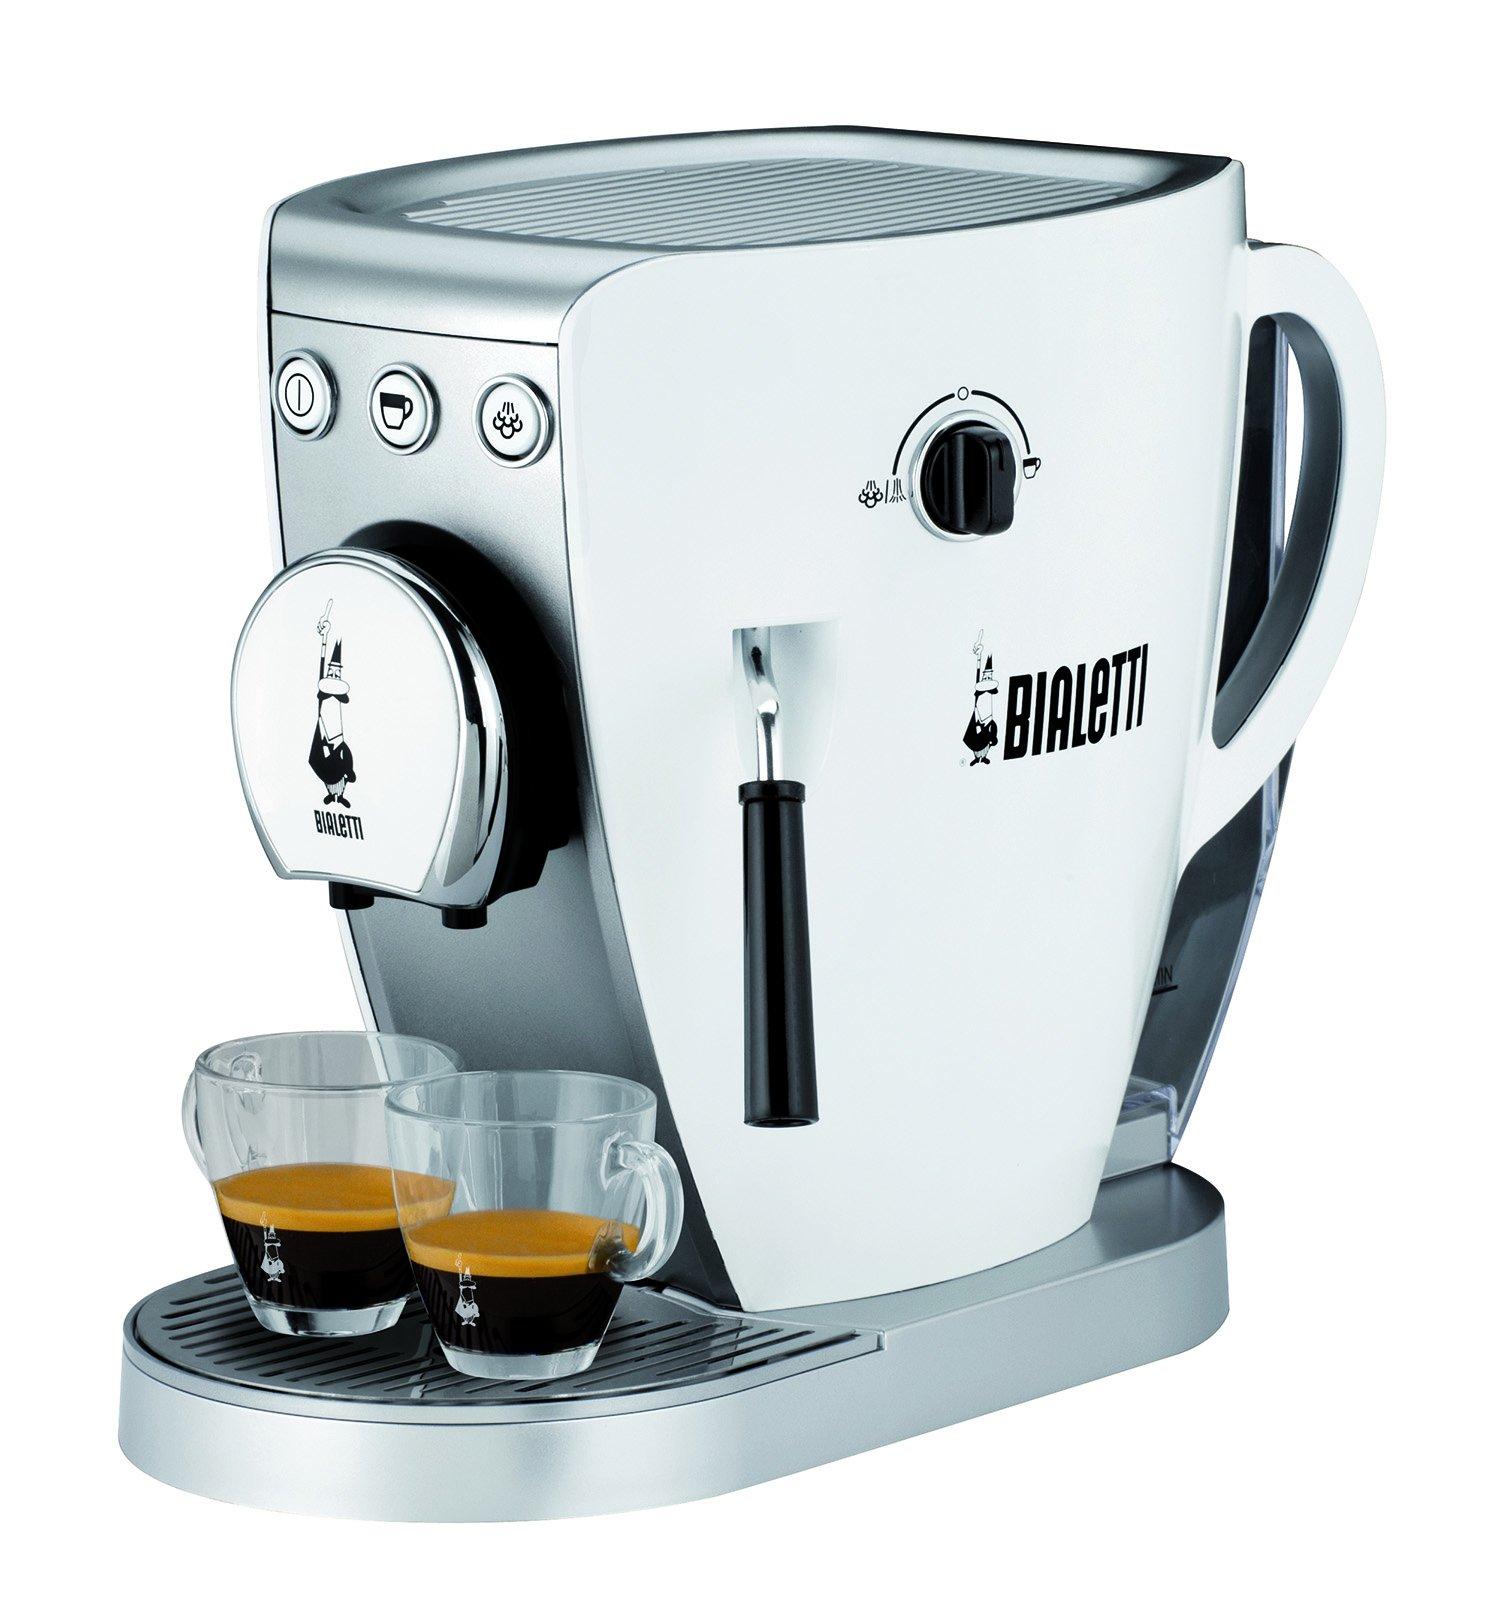 BIALETTI (Bialetti) espresso machine TAZZISSIMA tagissima white CF37-WH by BIALETTI (Biaretti)